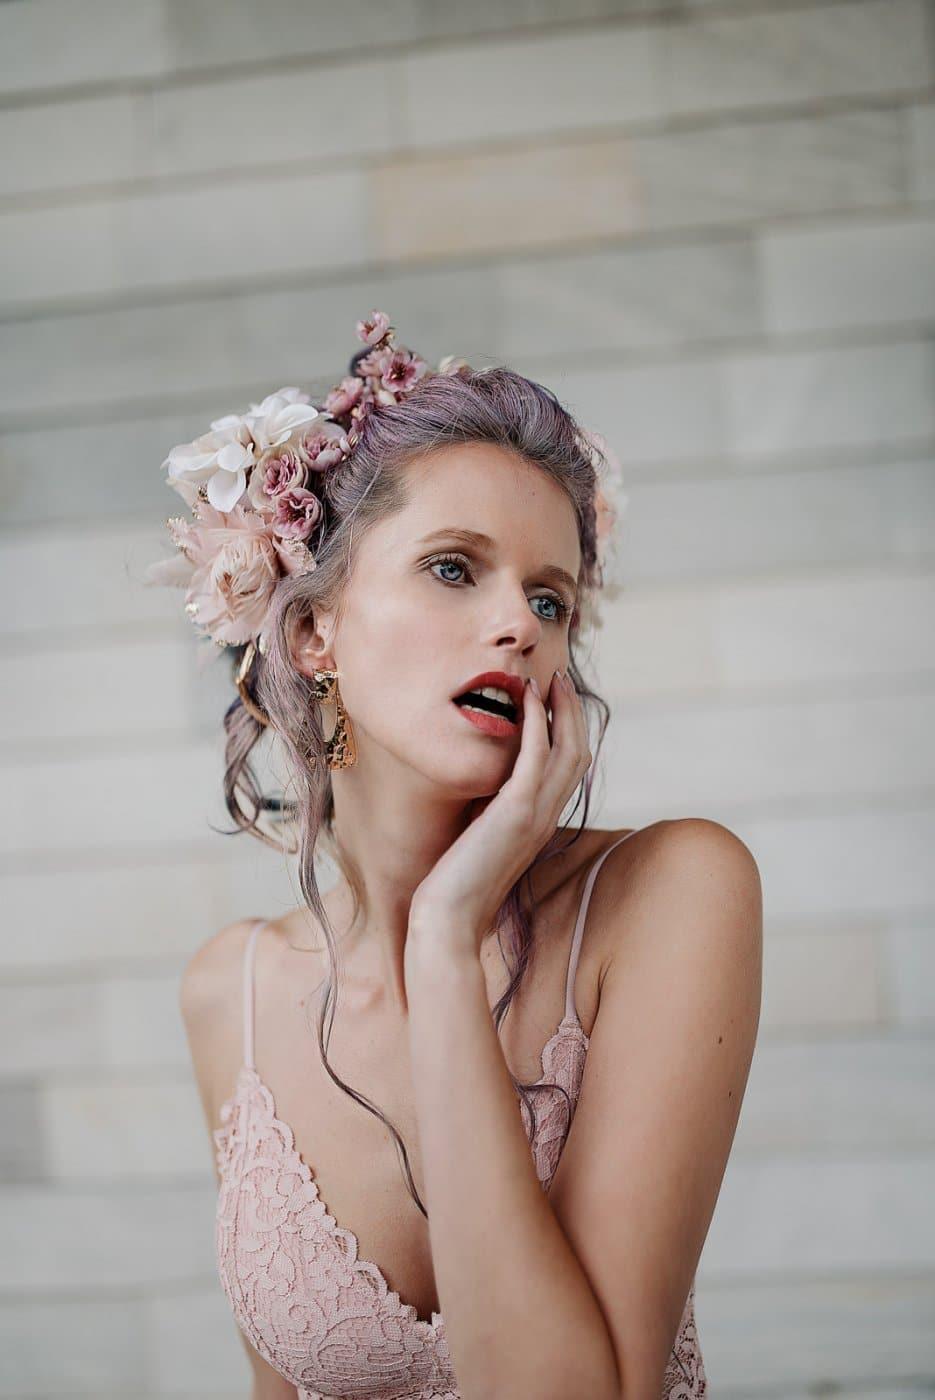 Fashion Portrait Photography By Anastasia Vervueren Marie Antionette Lingerie